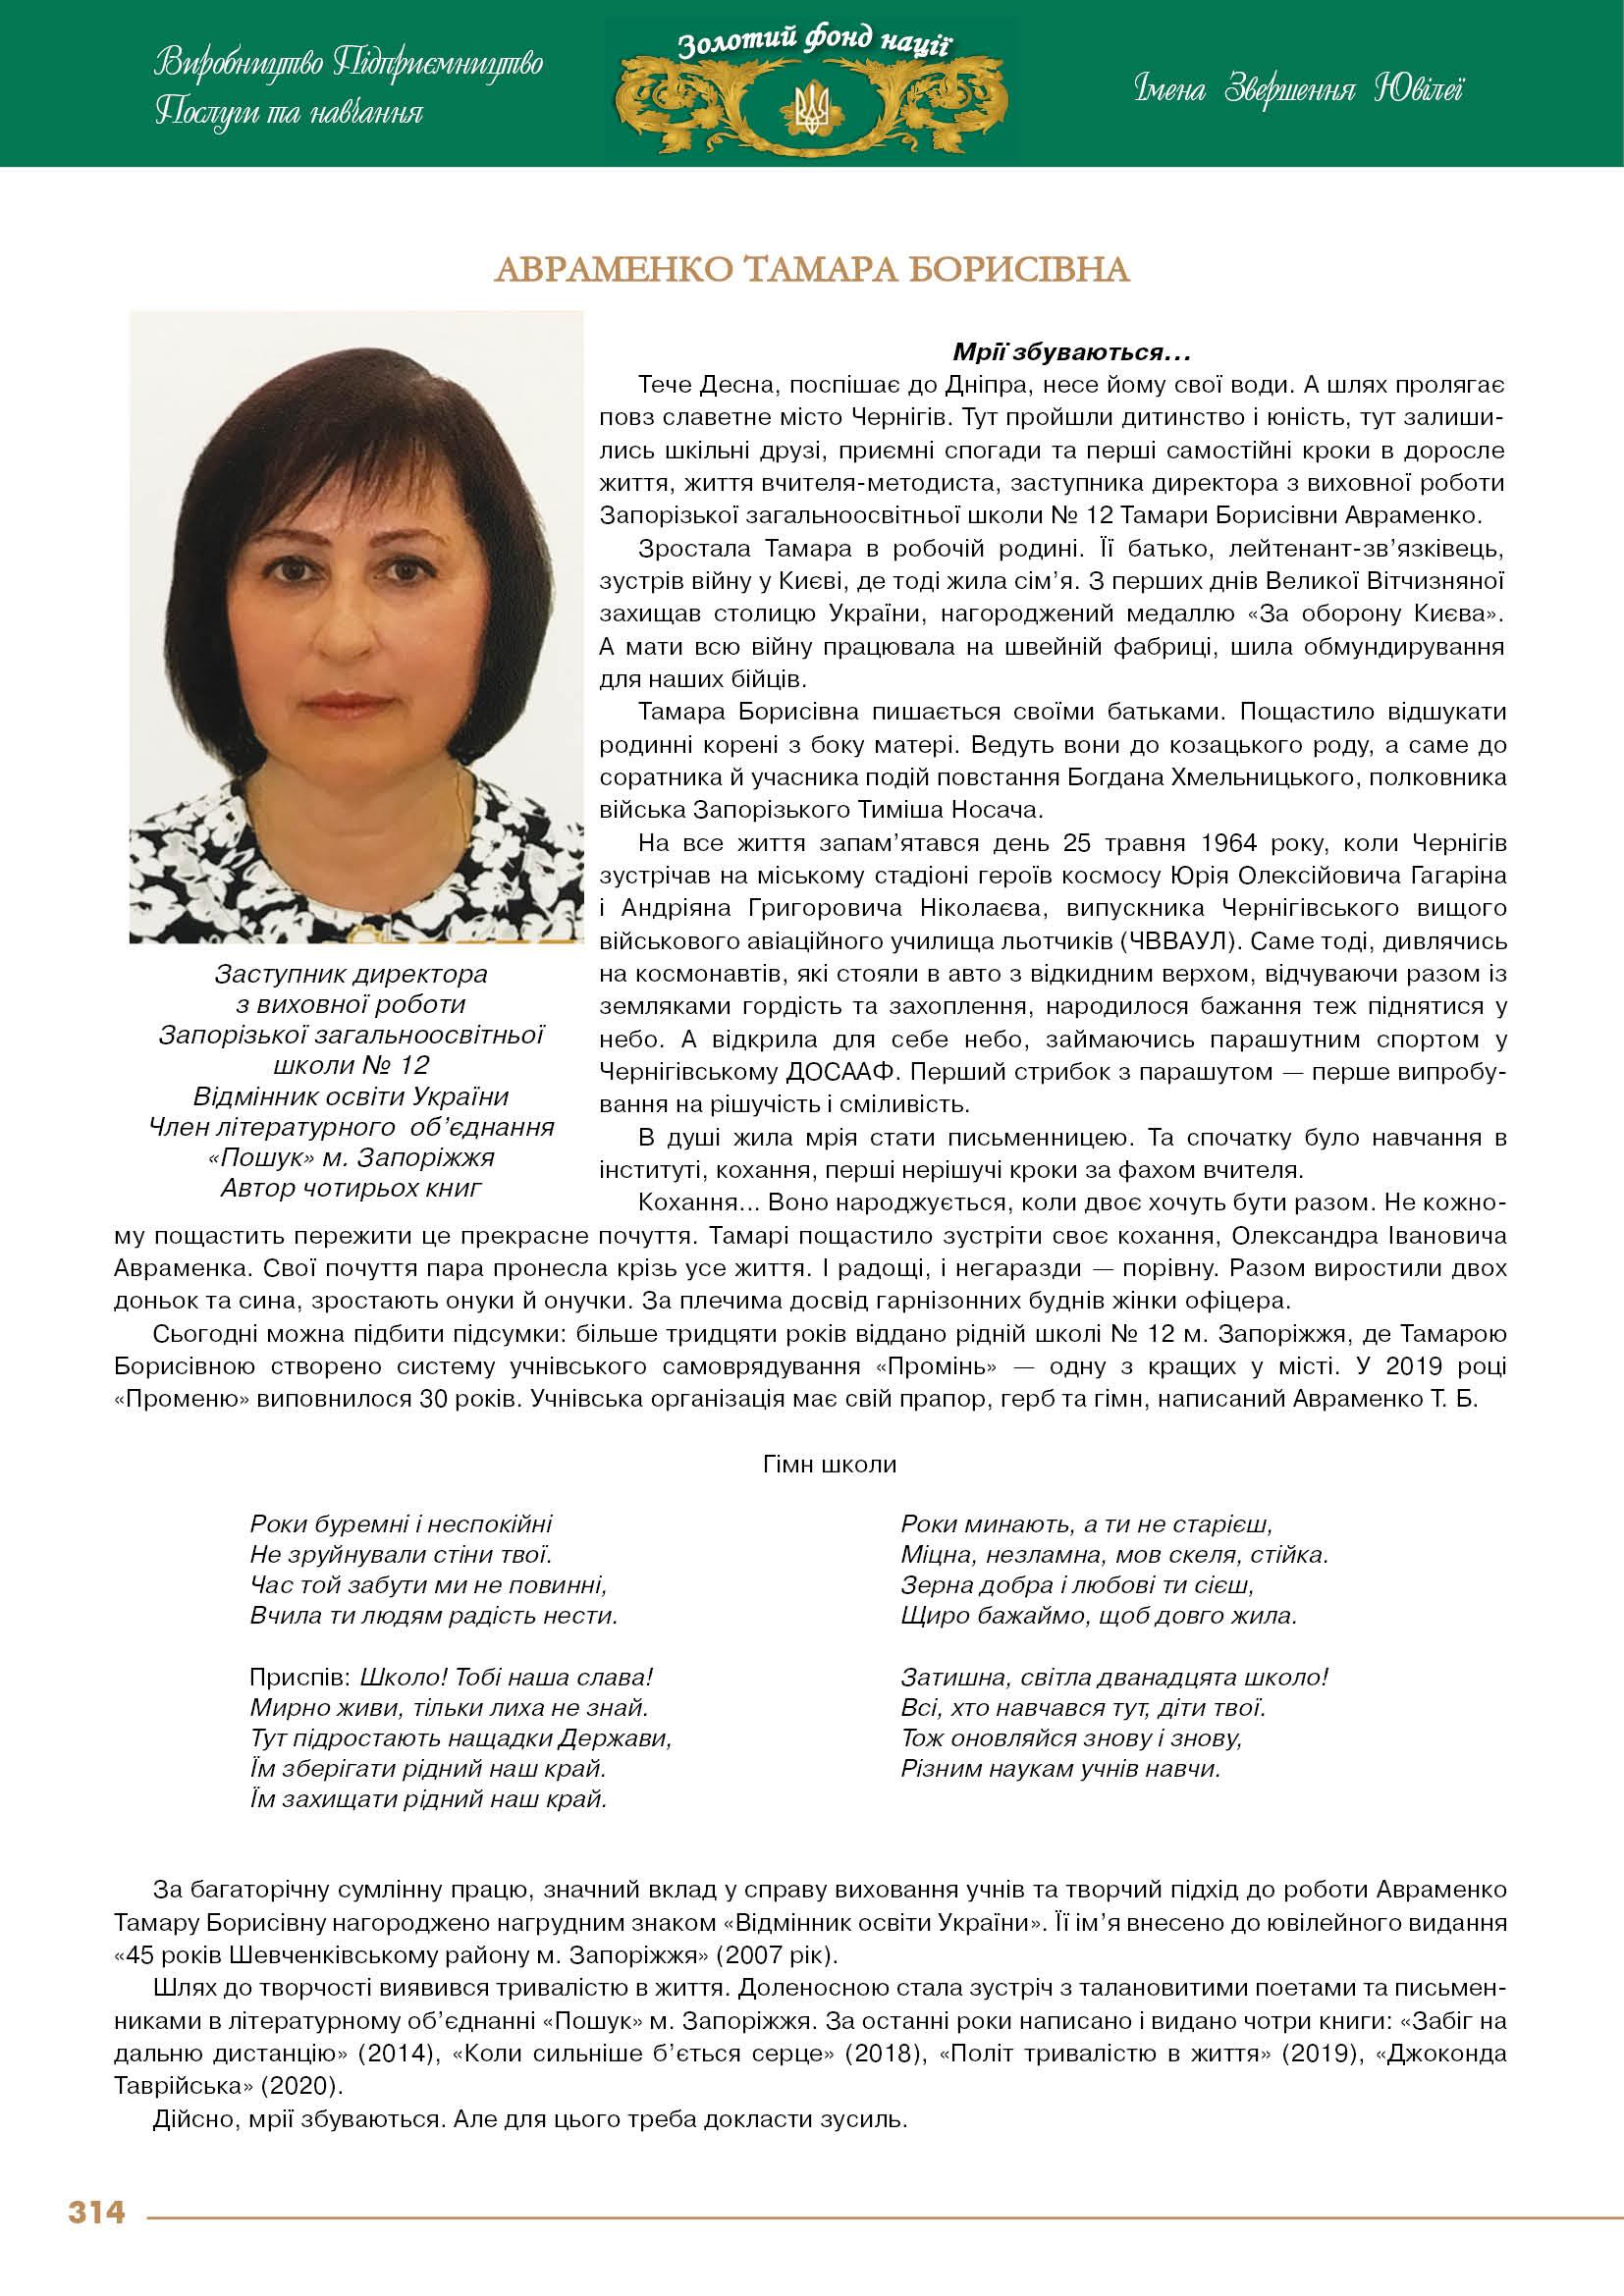 Авраменко Тамара Борисівна